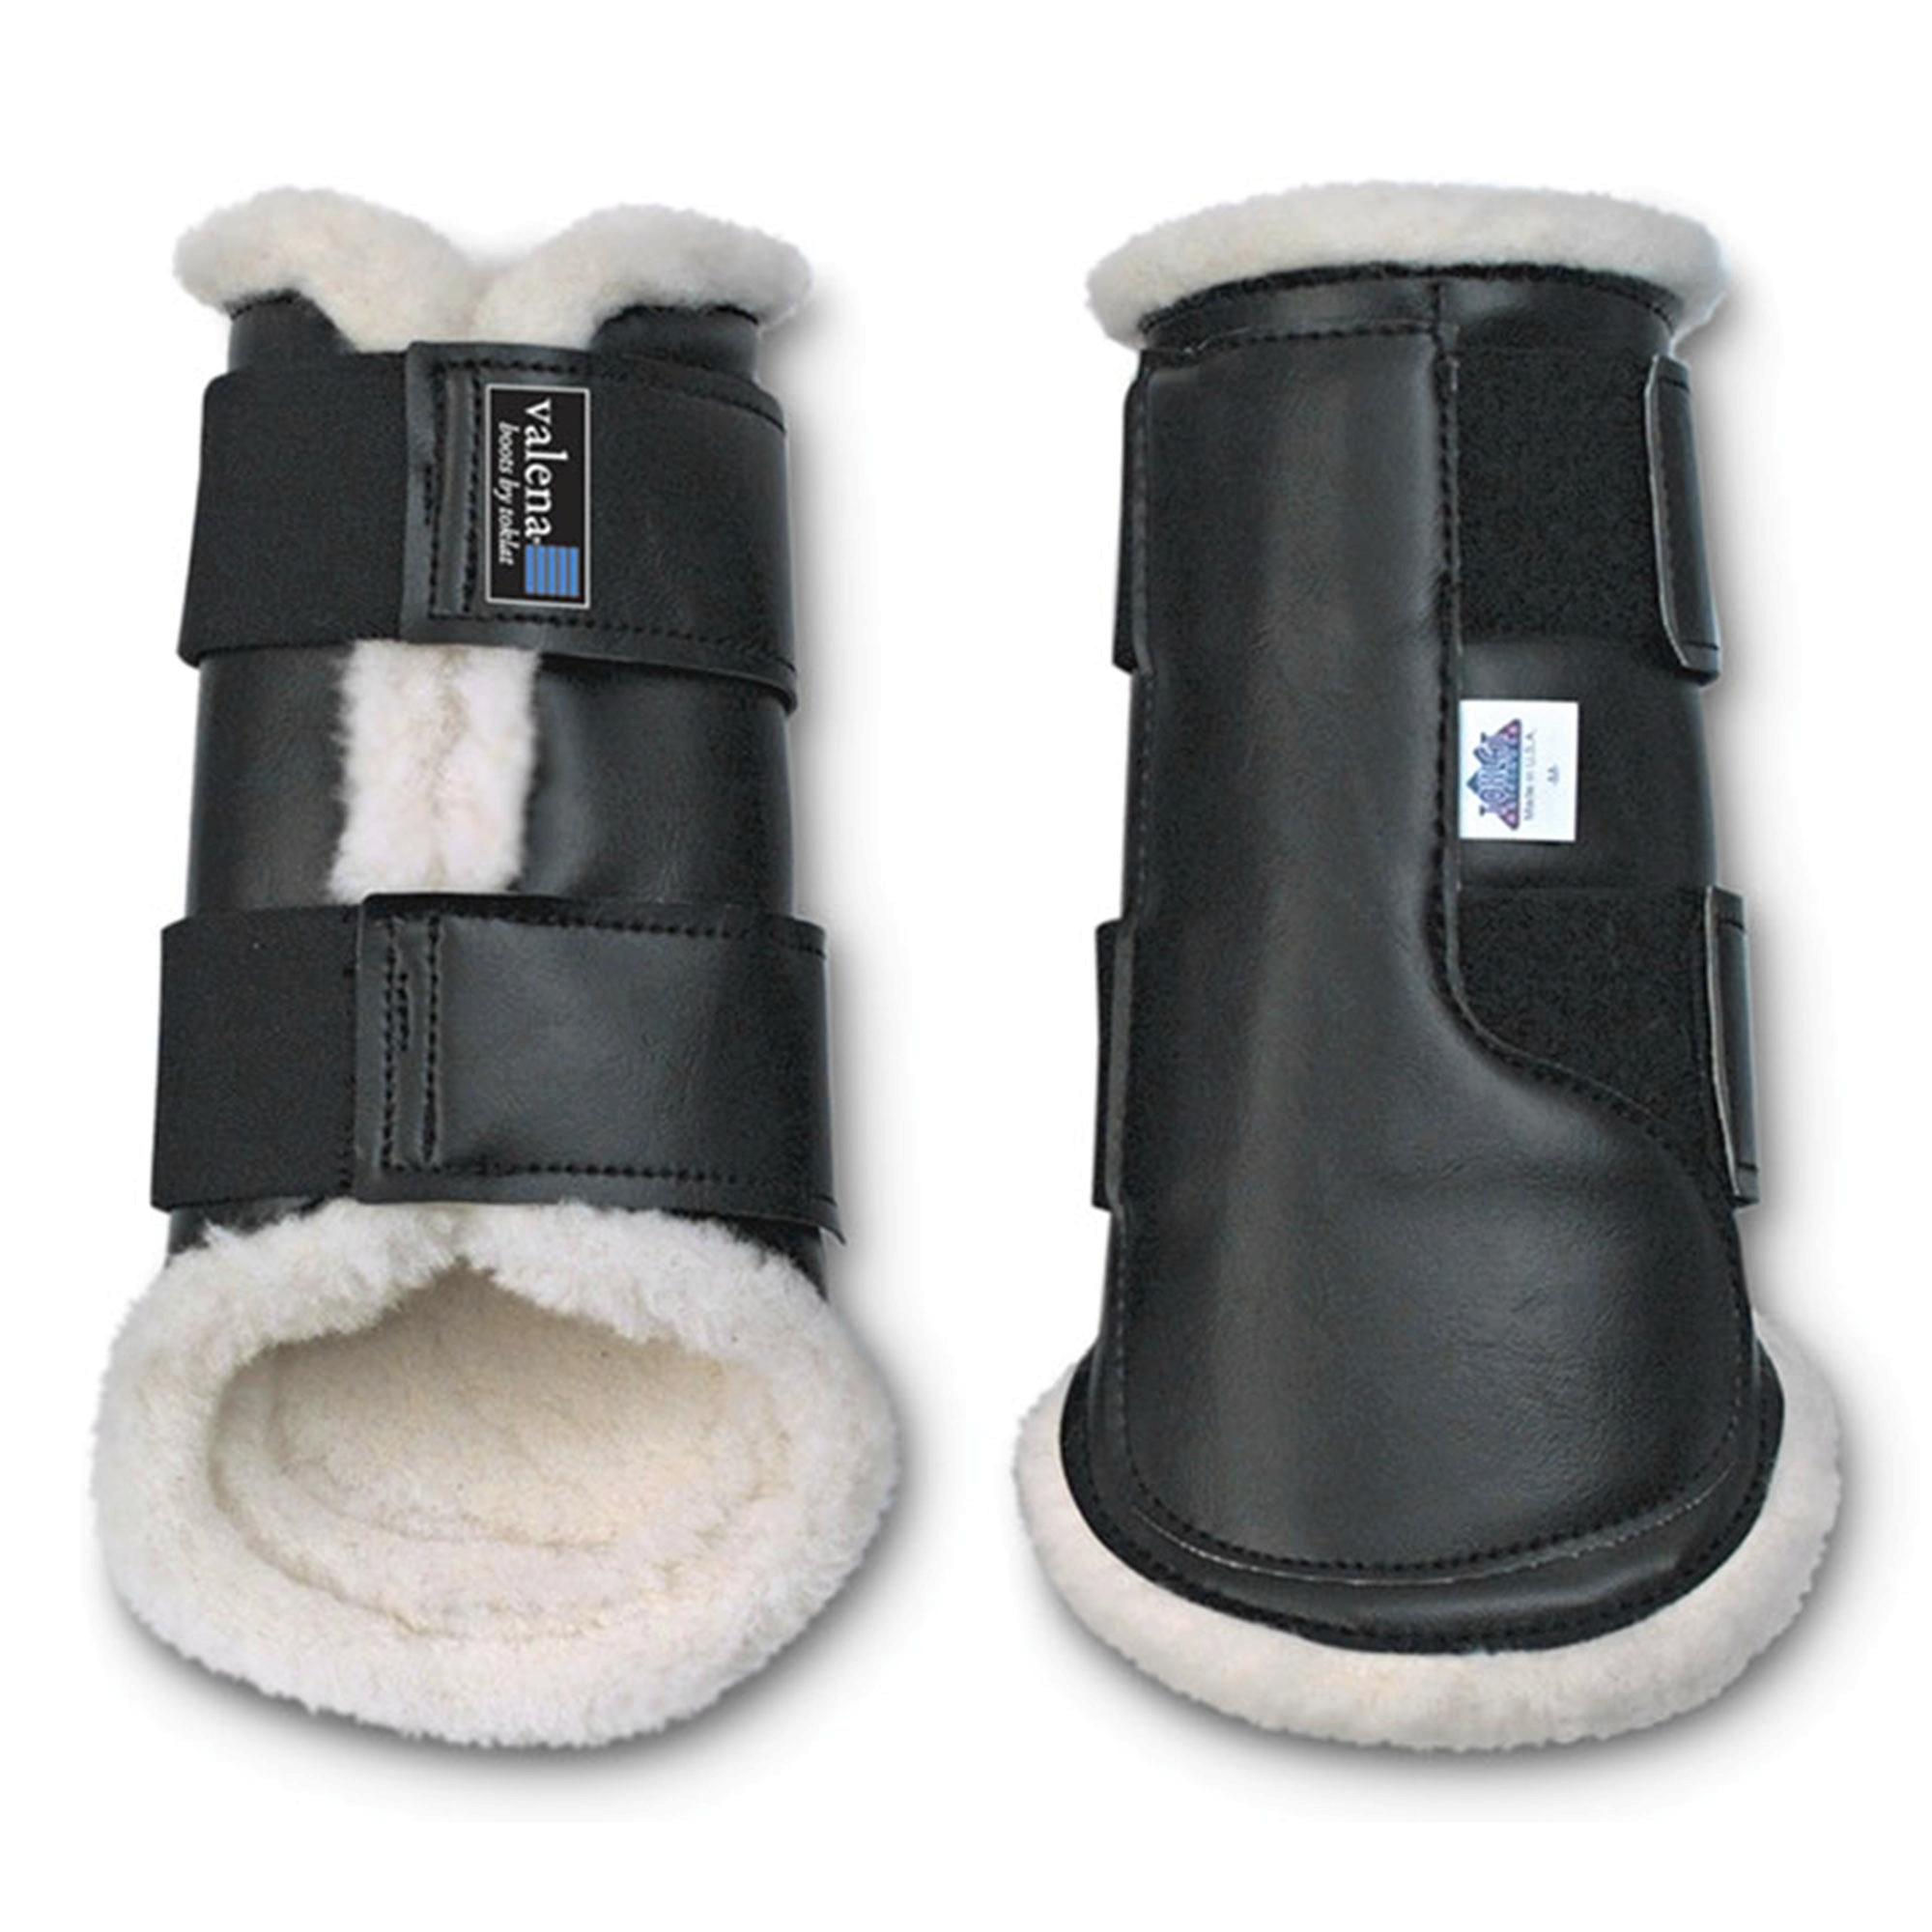 Toklat Valena Hind Boot